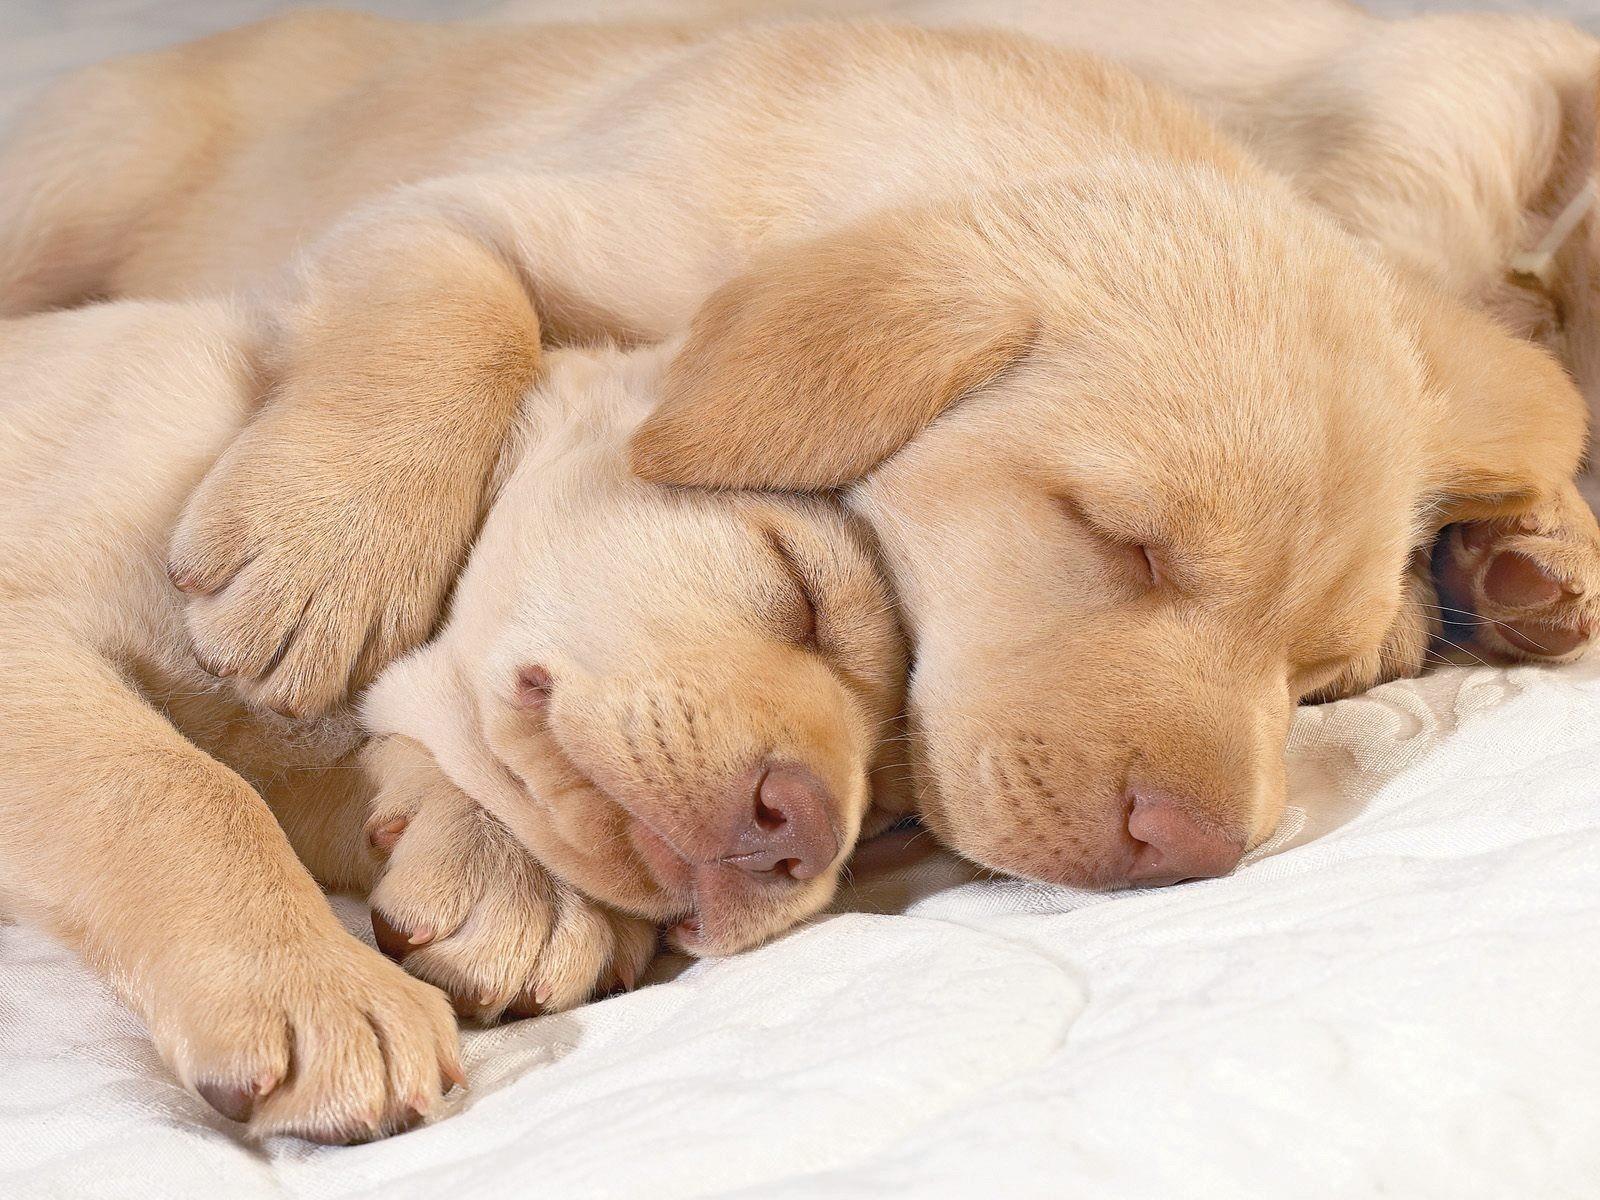 http://1.bp.blogspot.com/-Wy7rN4hfv4Q/T18P0WzA-yI/AAAAAAAAZxQ/NZZYE_1YwJI/s1600/Dogs+(50).jpg